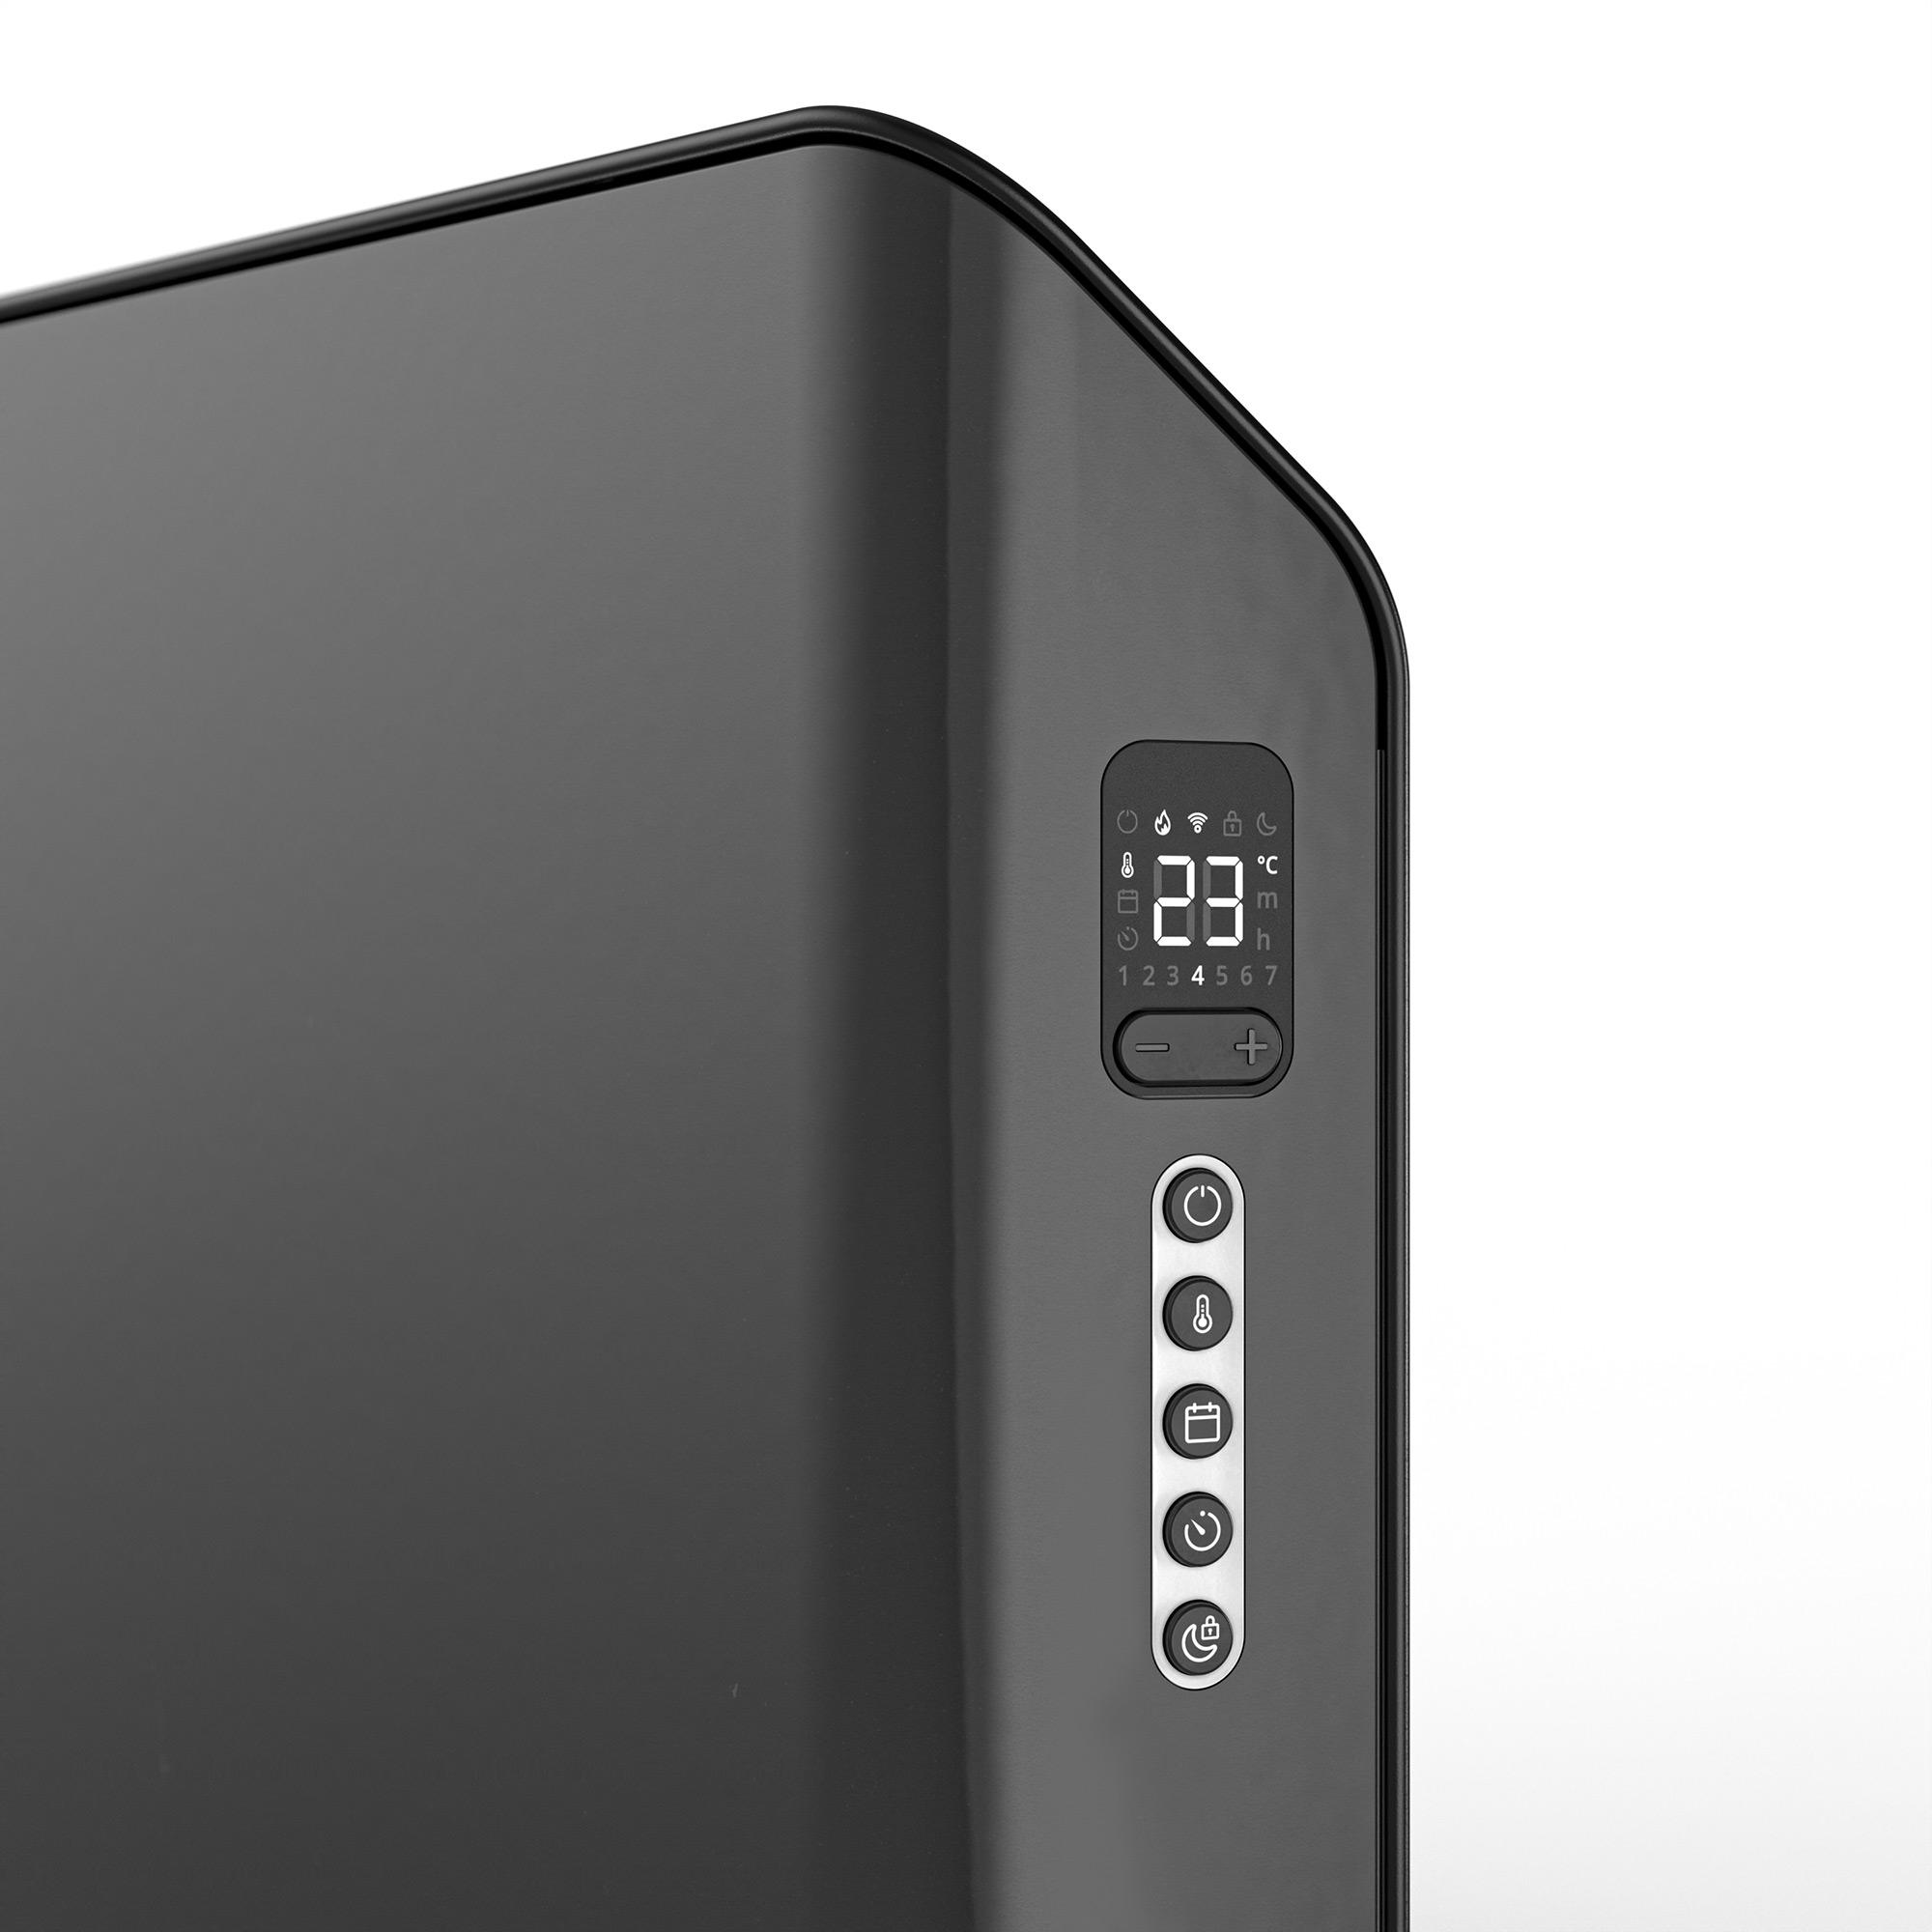 DUUX-dark-grey-Radiator-E-Commerce-Amazon-Image-Example-1